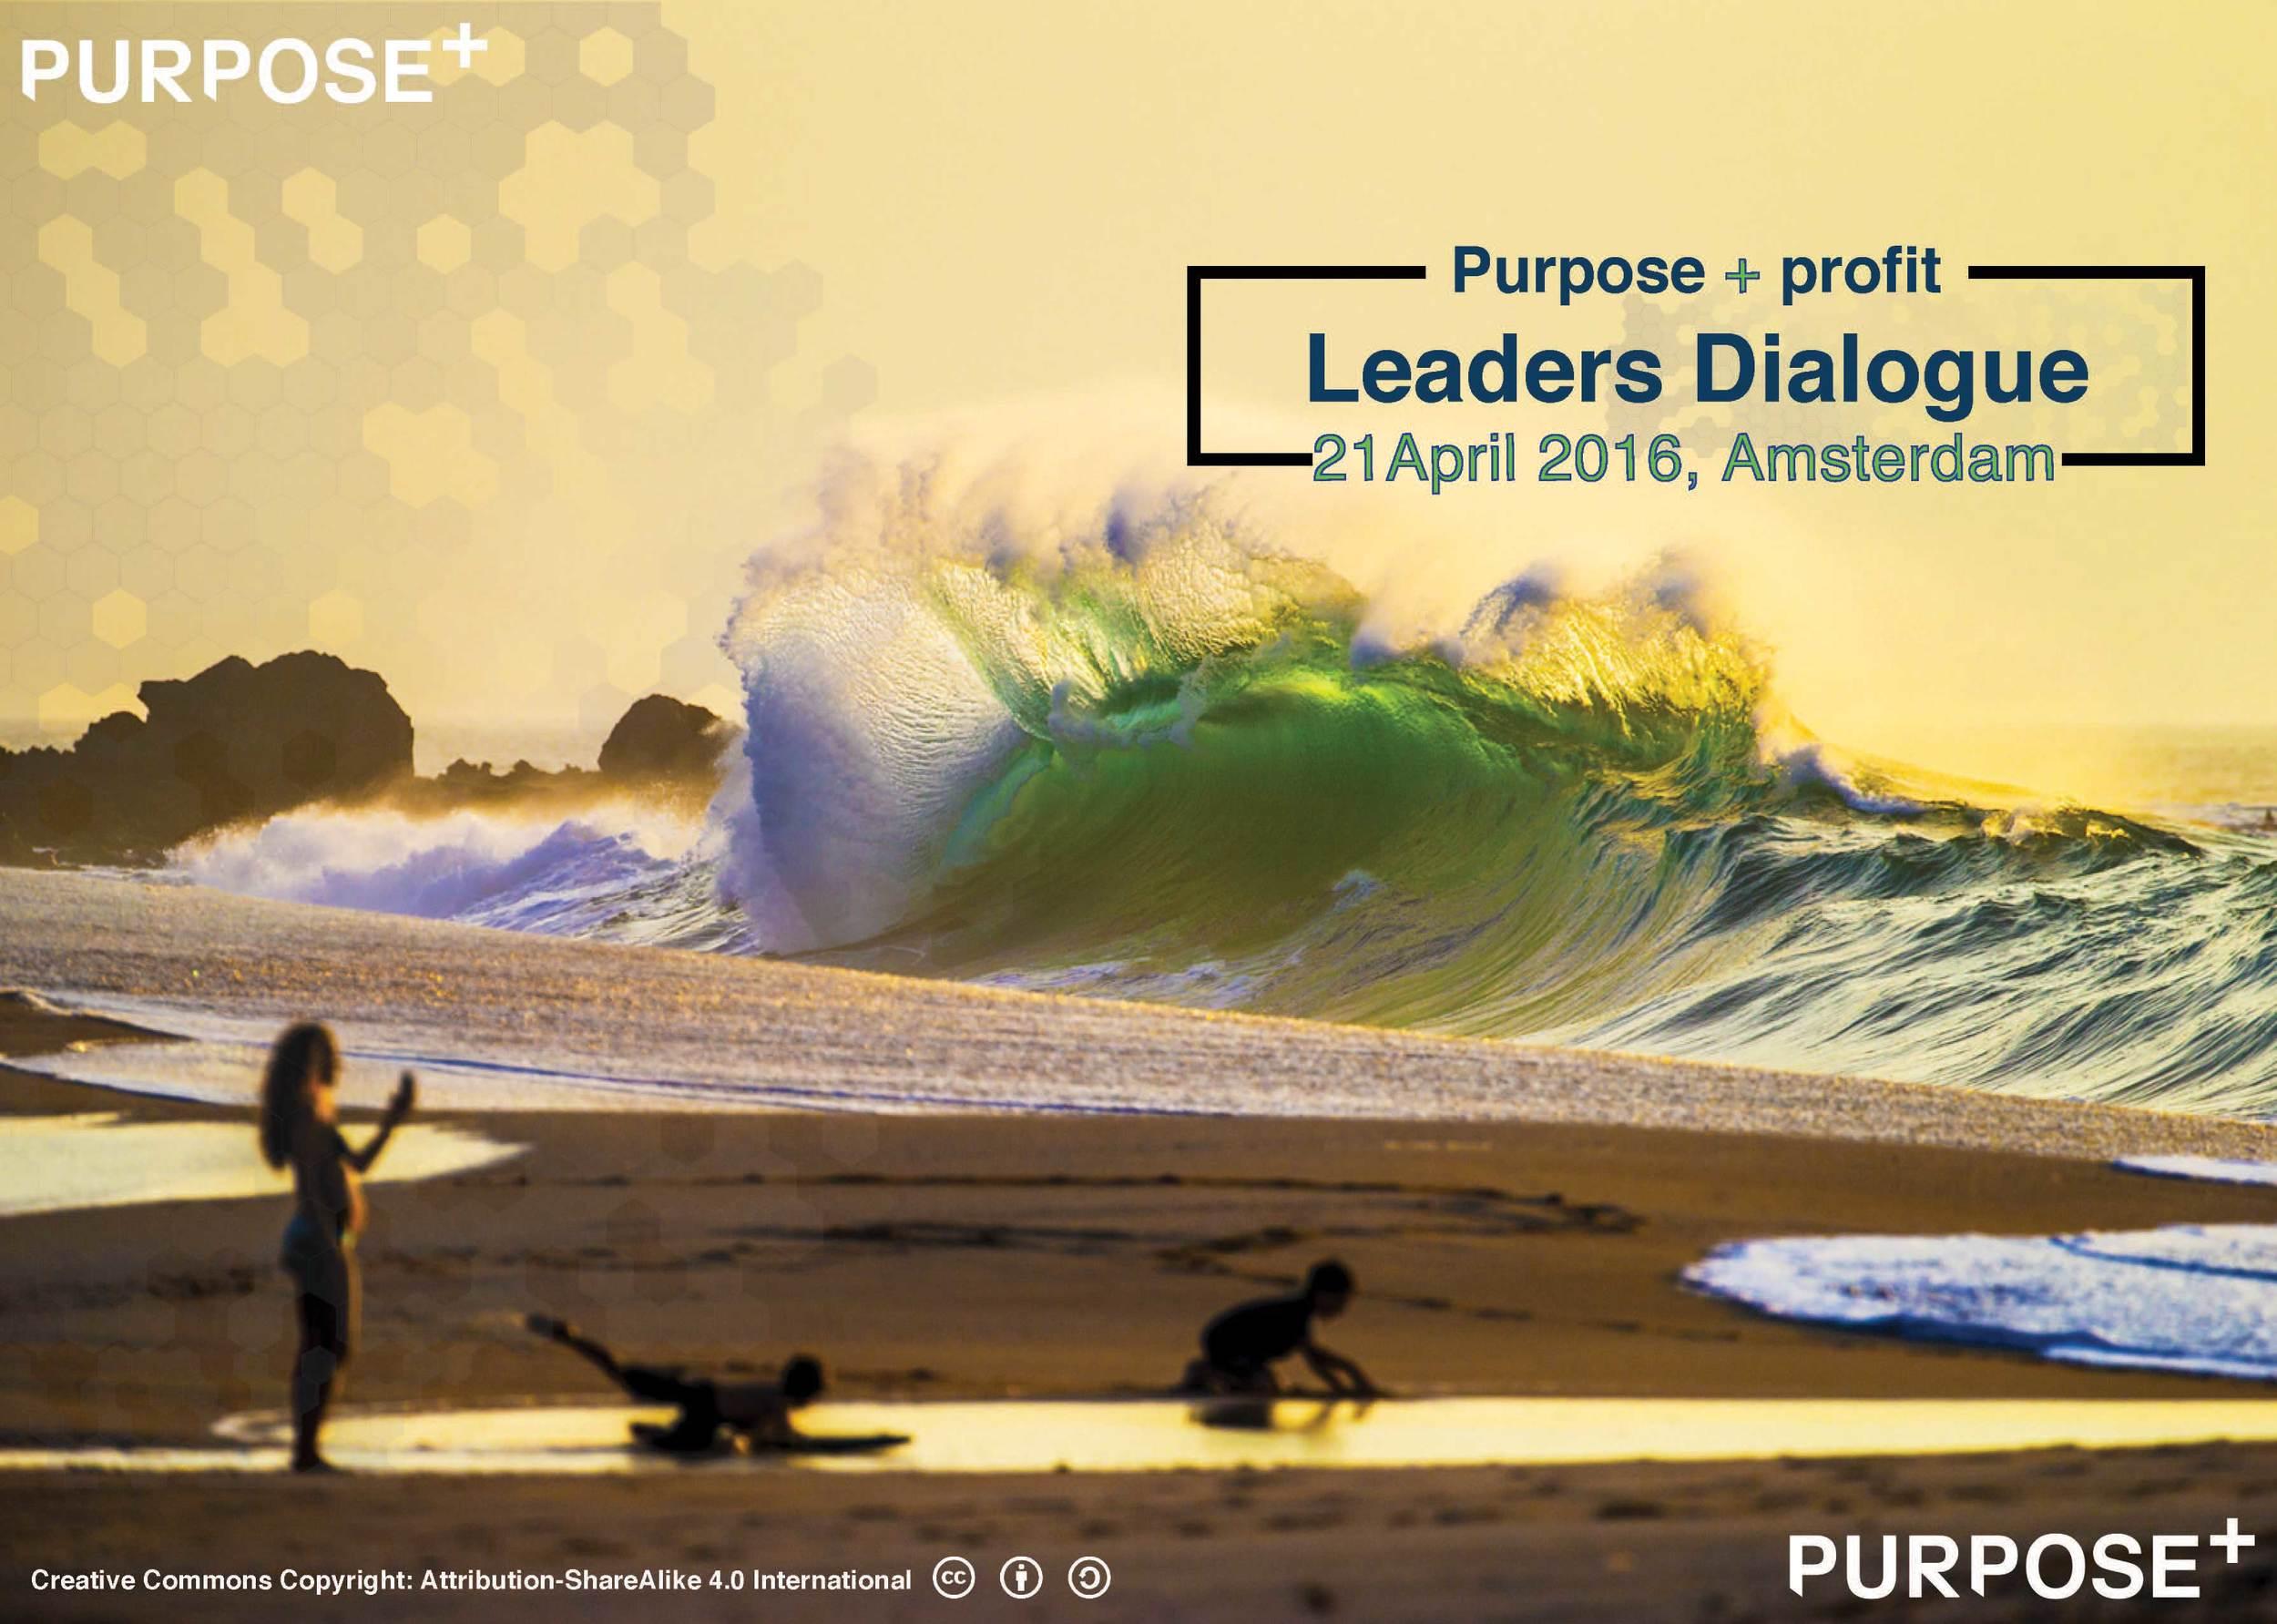 Purpose-beach-text-edit+_Page_1.jpg